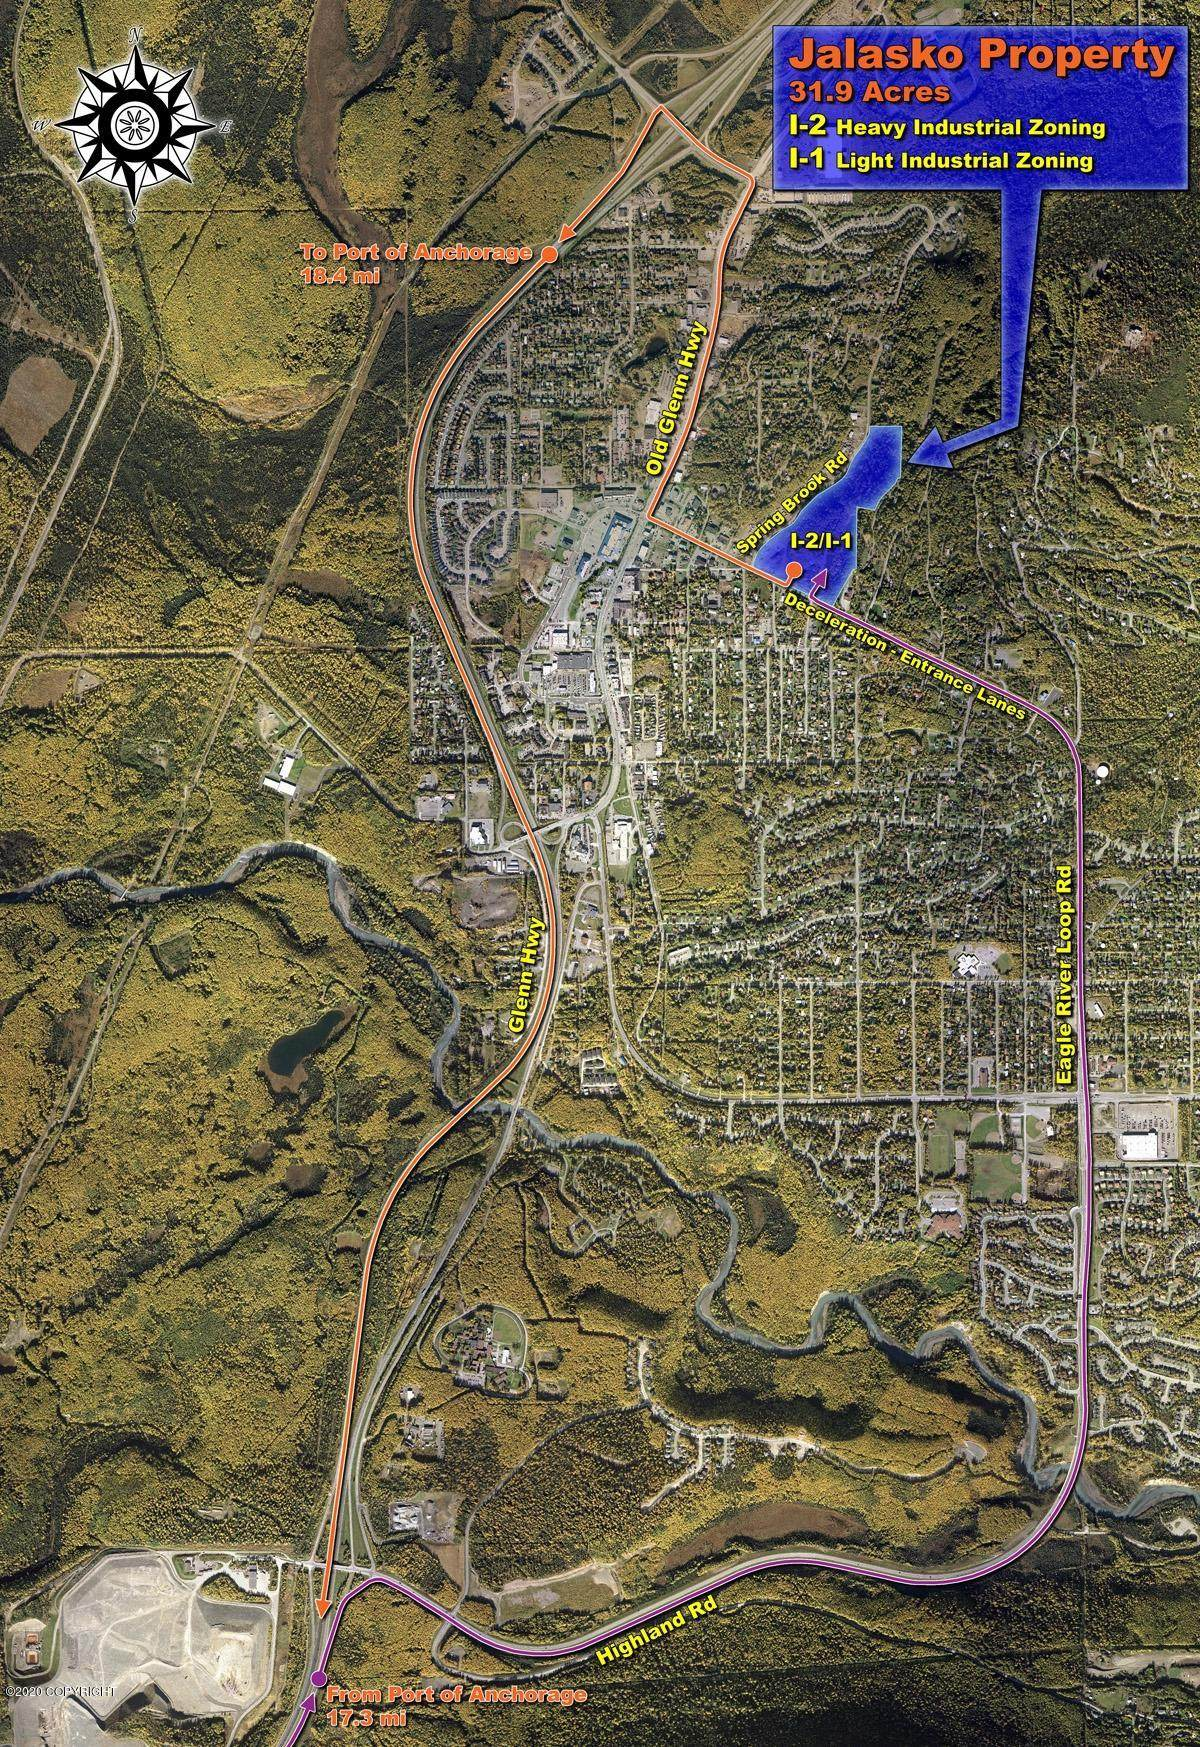 17227 Eagle River Loop Road - Photo 1